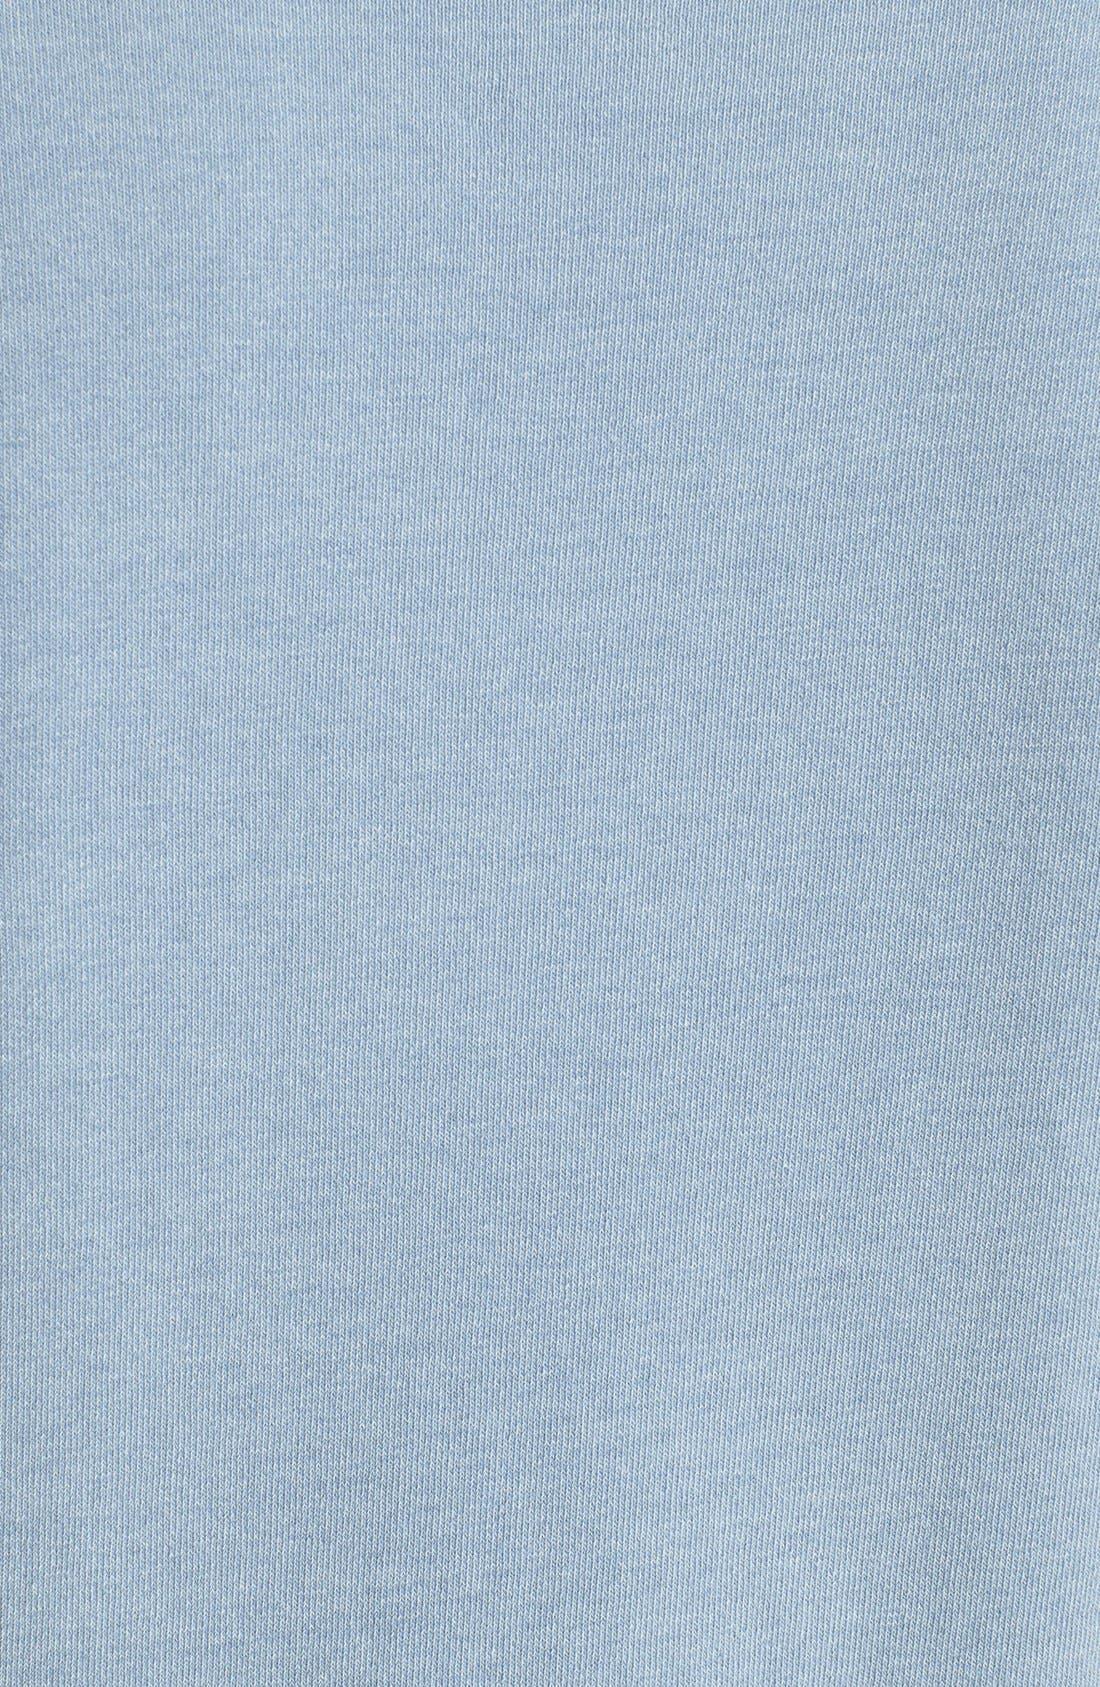 Alternate Image 3  - Splendid French Terry Sweatshirt